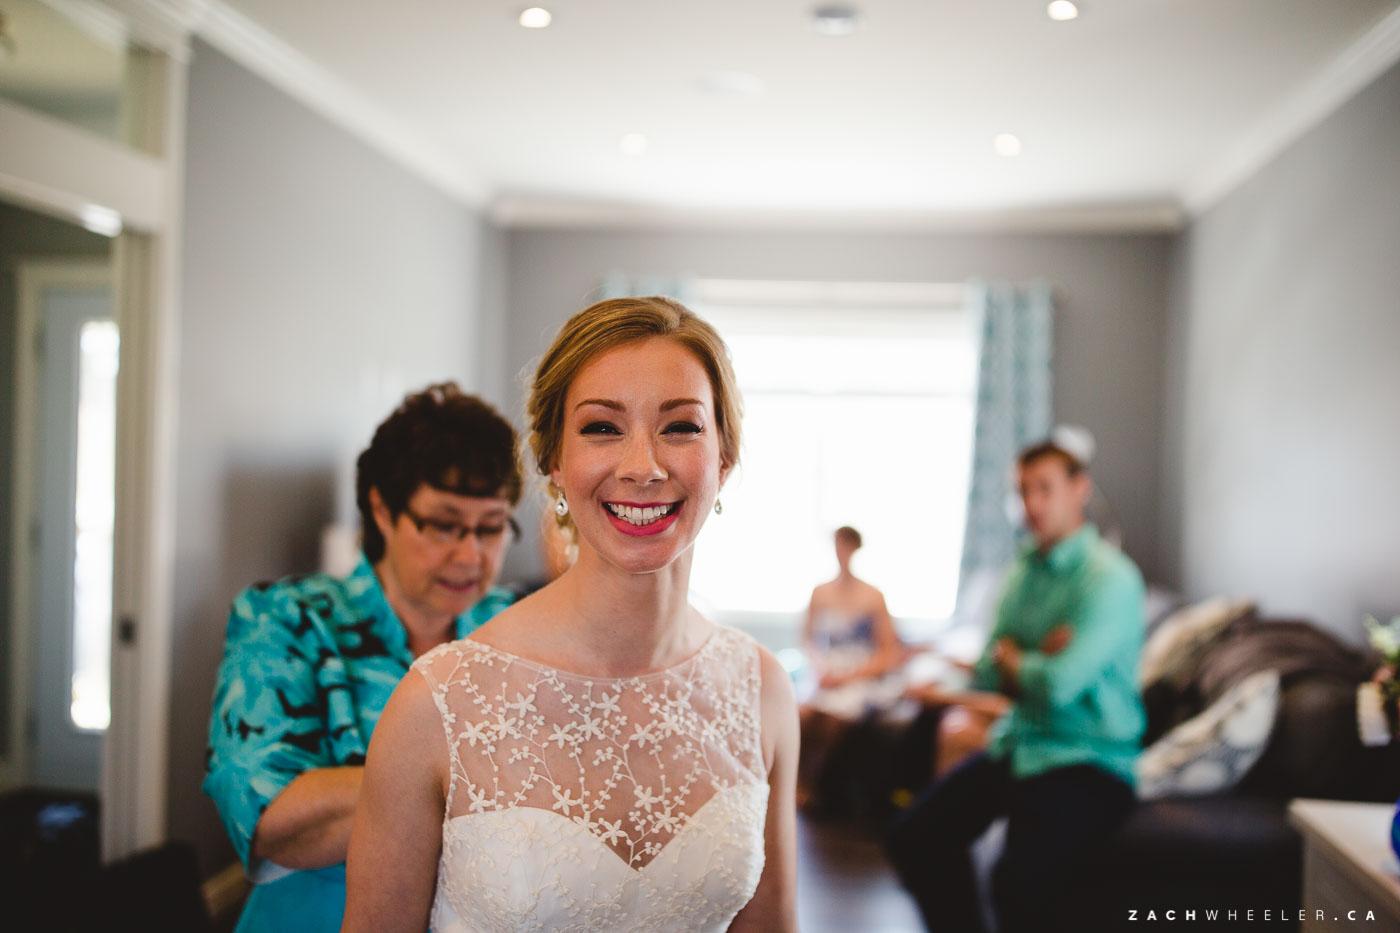 Sarah-Grant-Lesters-Fram-Wedding-21